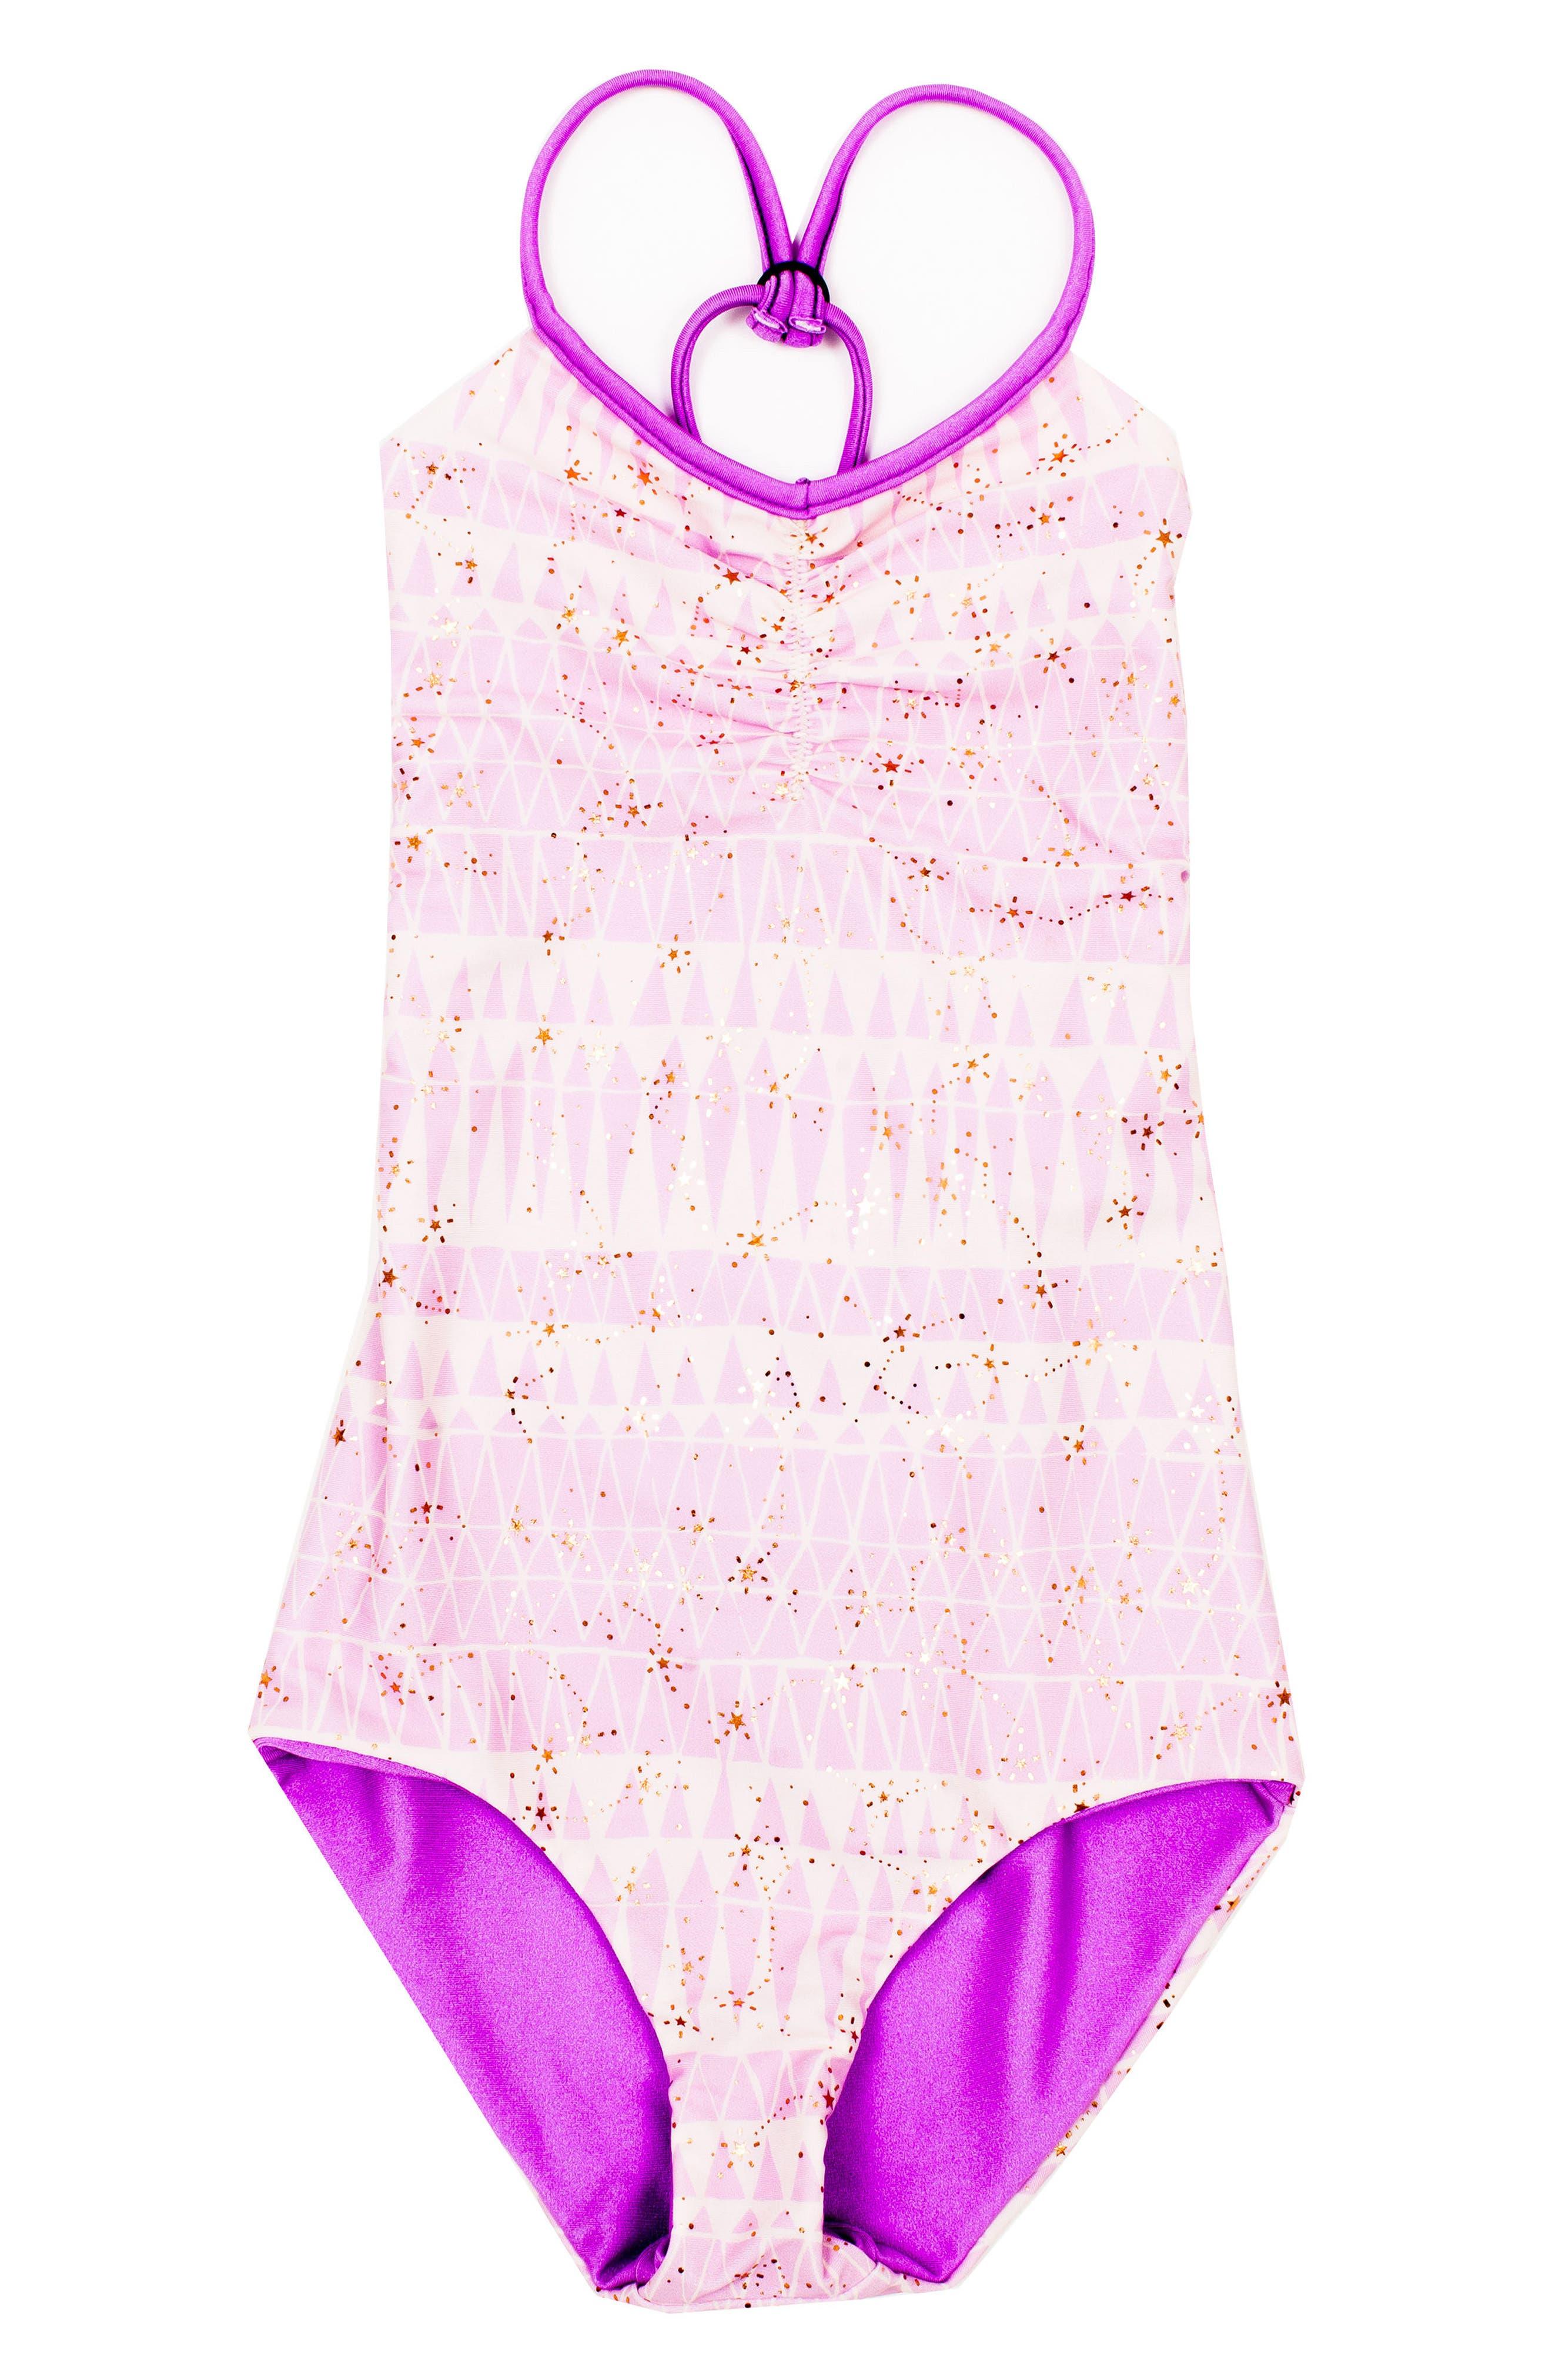 Catalinakini One-Piece Reversible Swimsuit,                         Main,                         color, Lavender